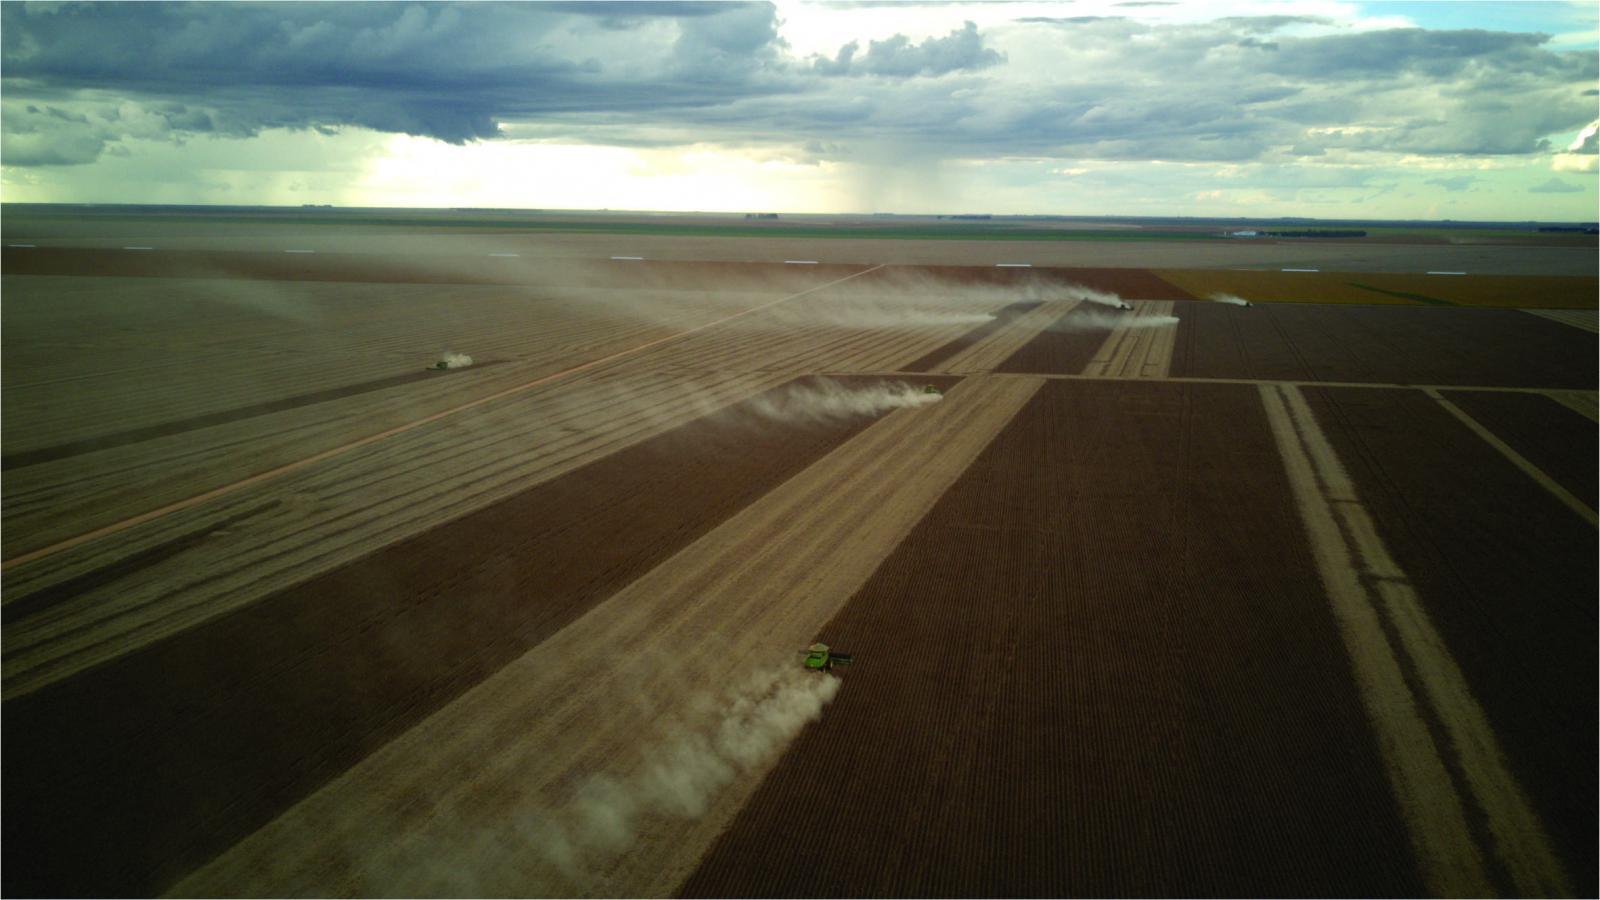 images/2018/04/carroll-farms-farmstead-45-gb1-1523485306mtuymzq4ntmwng.jpg